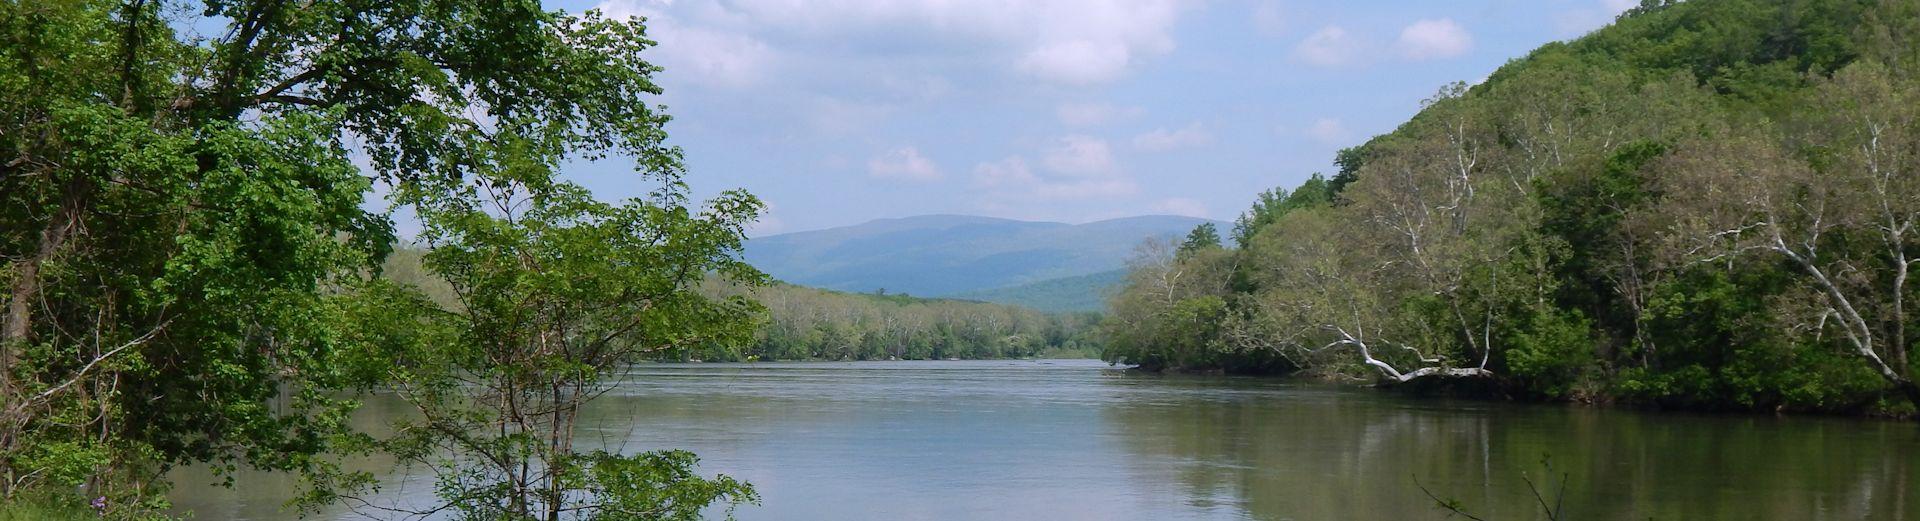 Shenandoah River View At Misty River Retreat Luray Va